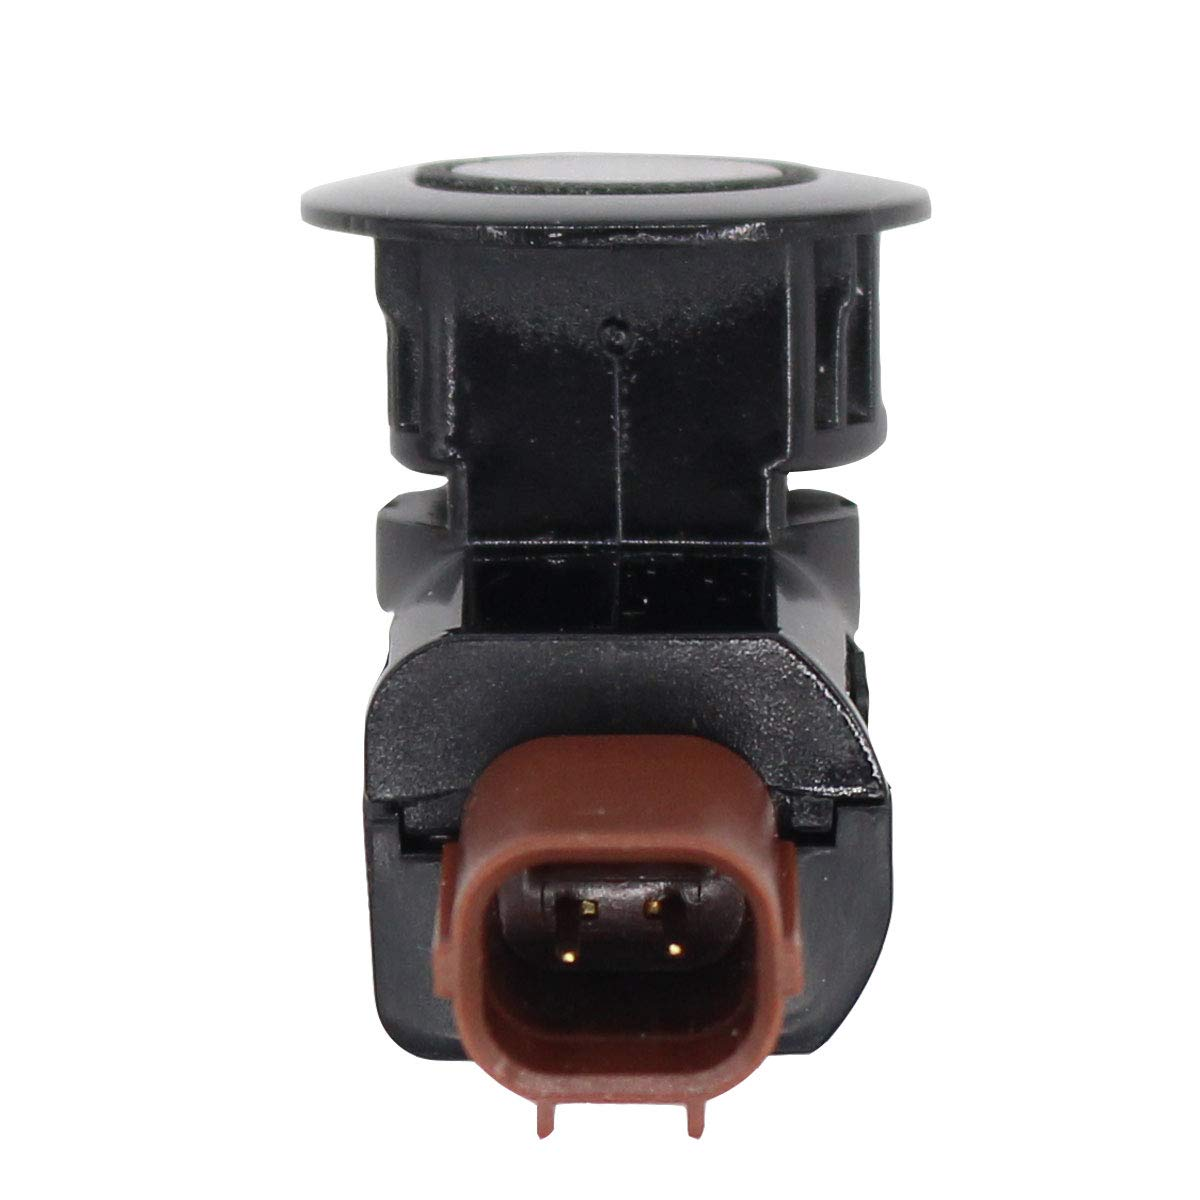 NewYall Front and Rear Bumper Backup Parking Assist Sensor